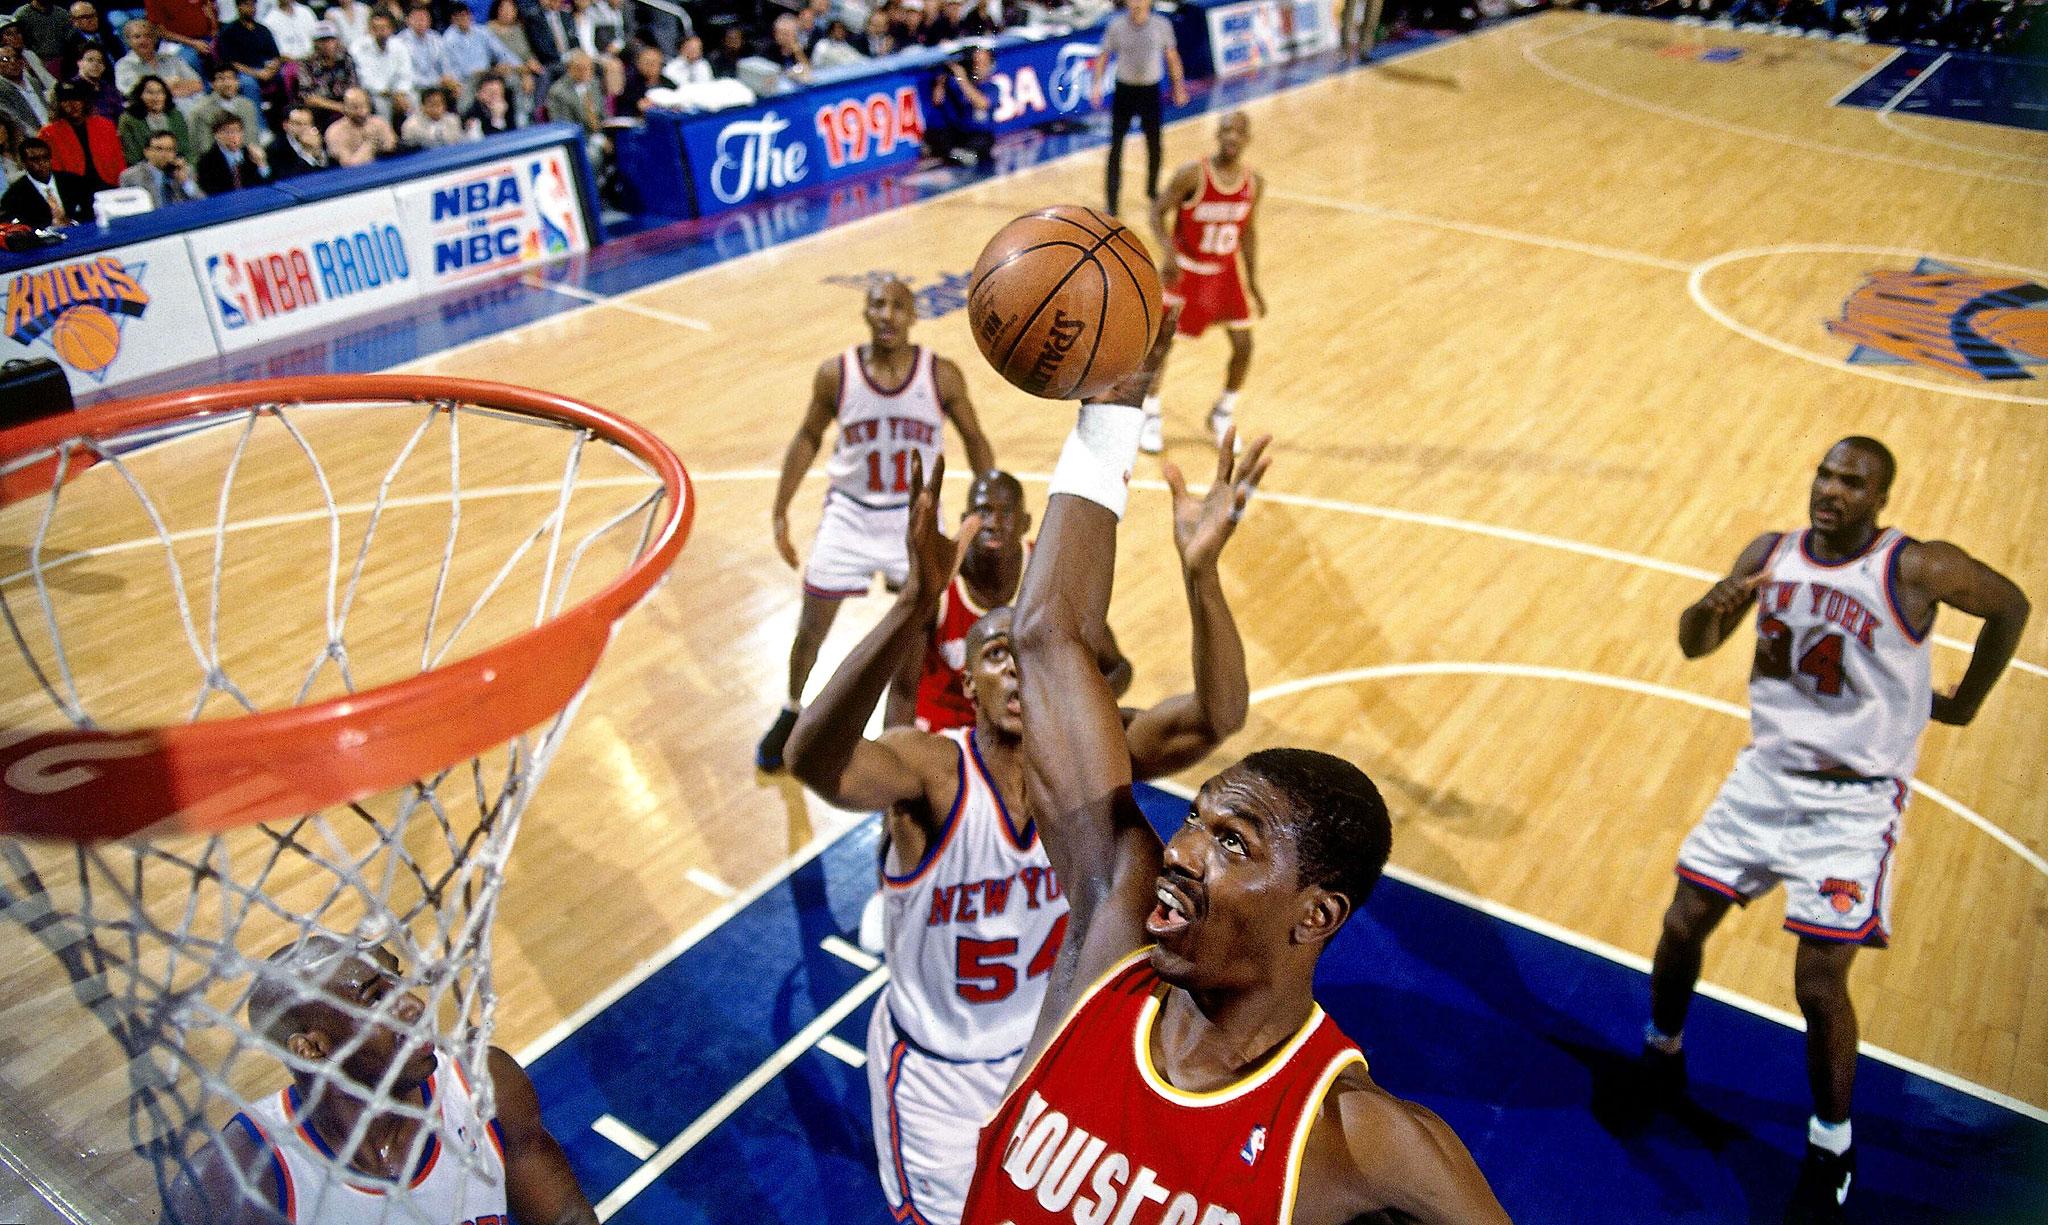 Hakeem Olajuwon - June 17, 1994 - ESPN